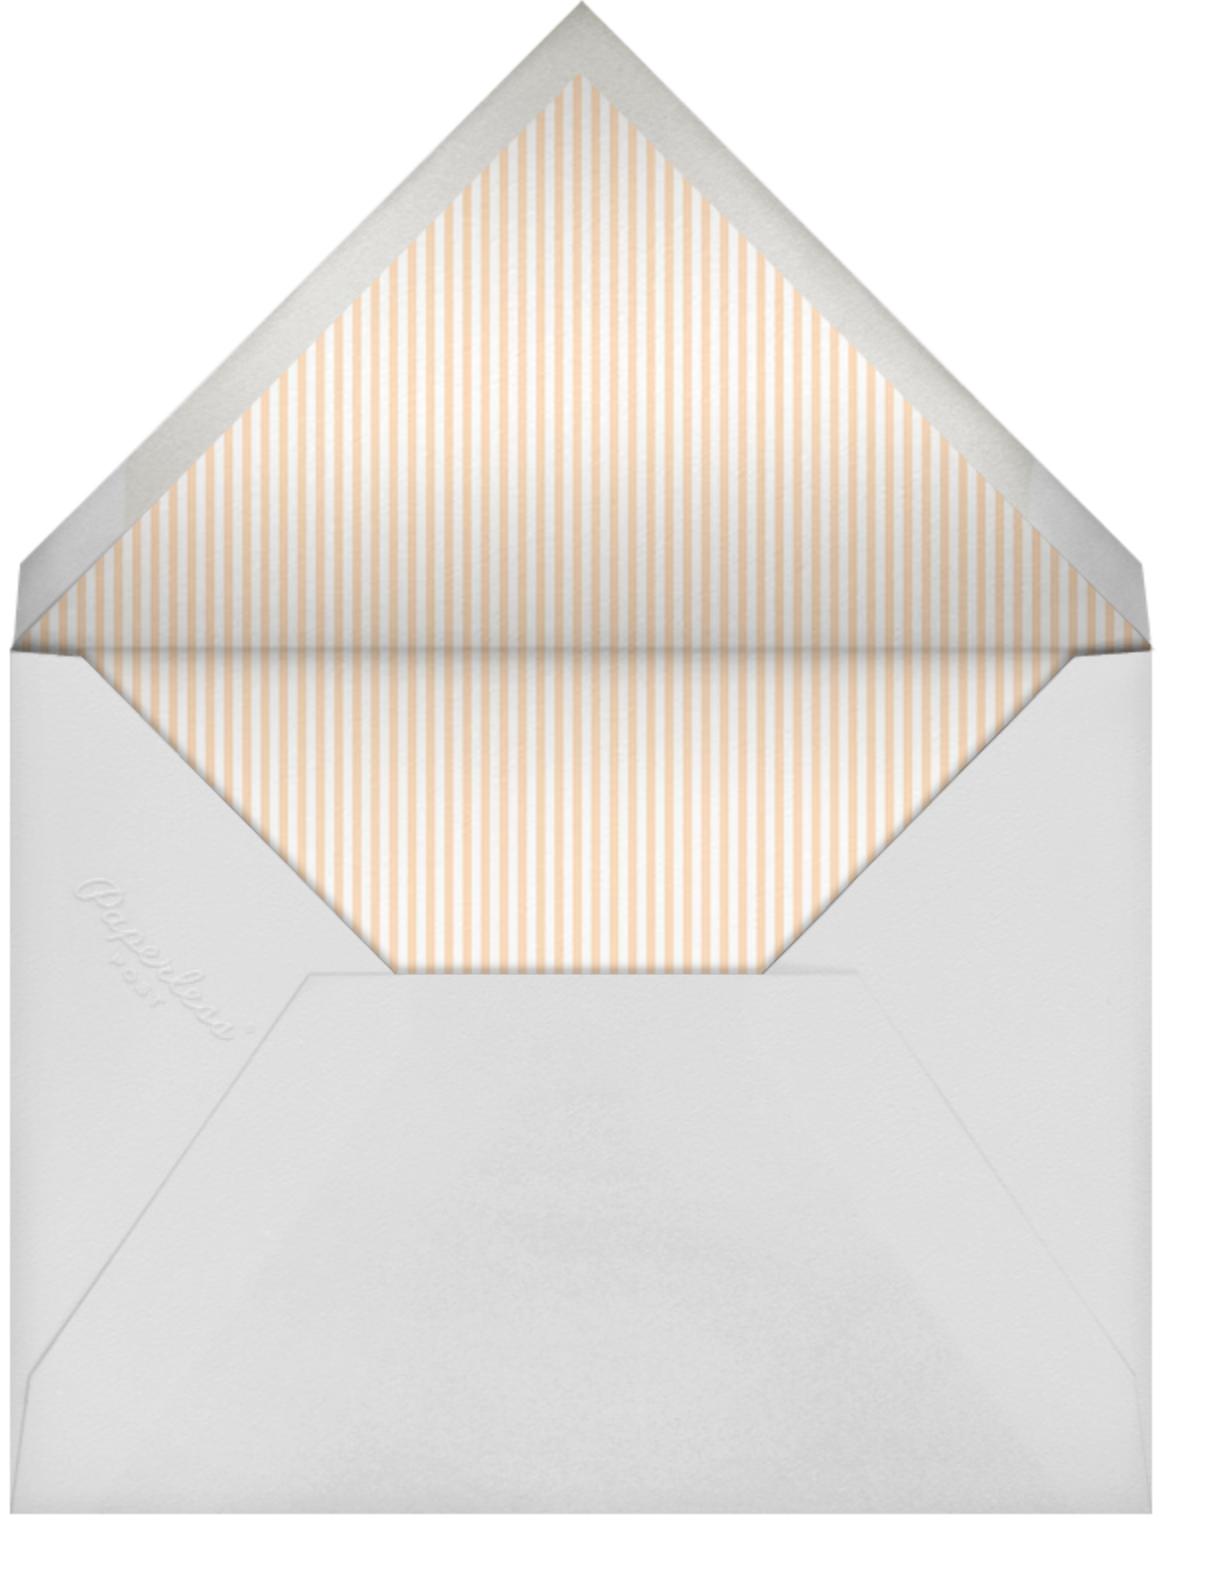 Here Comes the Stork - Pink - Sugar Paper - Envelope